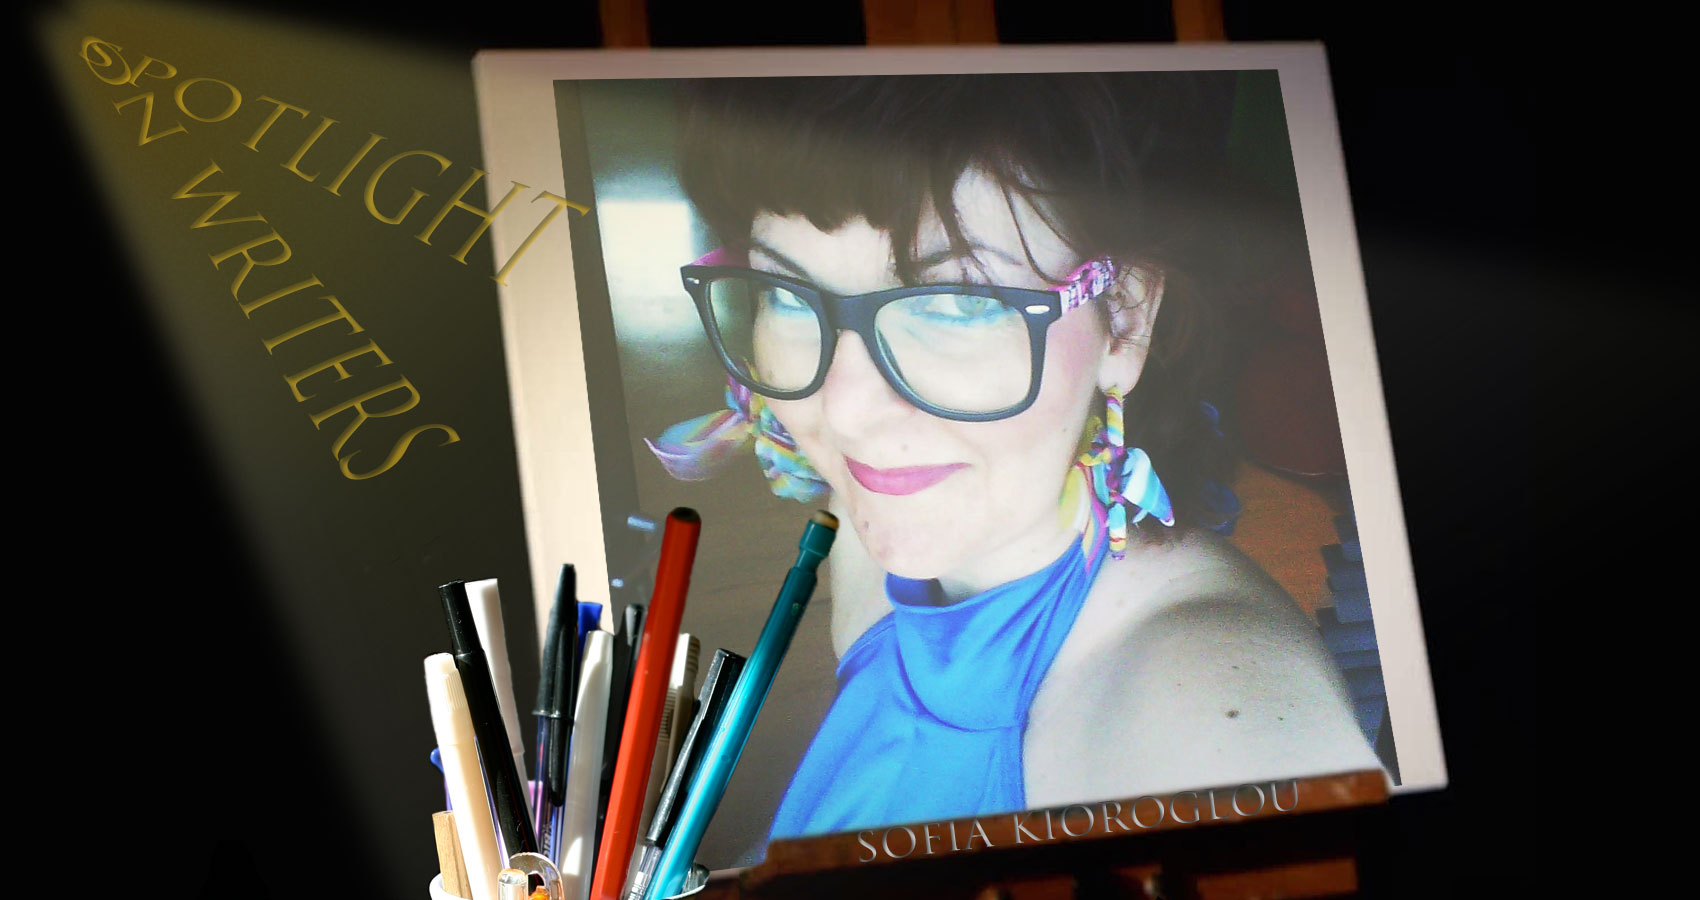 Spotlight On Writers - Sofia Kioroglou at Spillwords.com